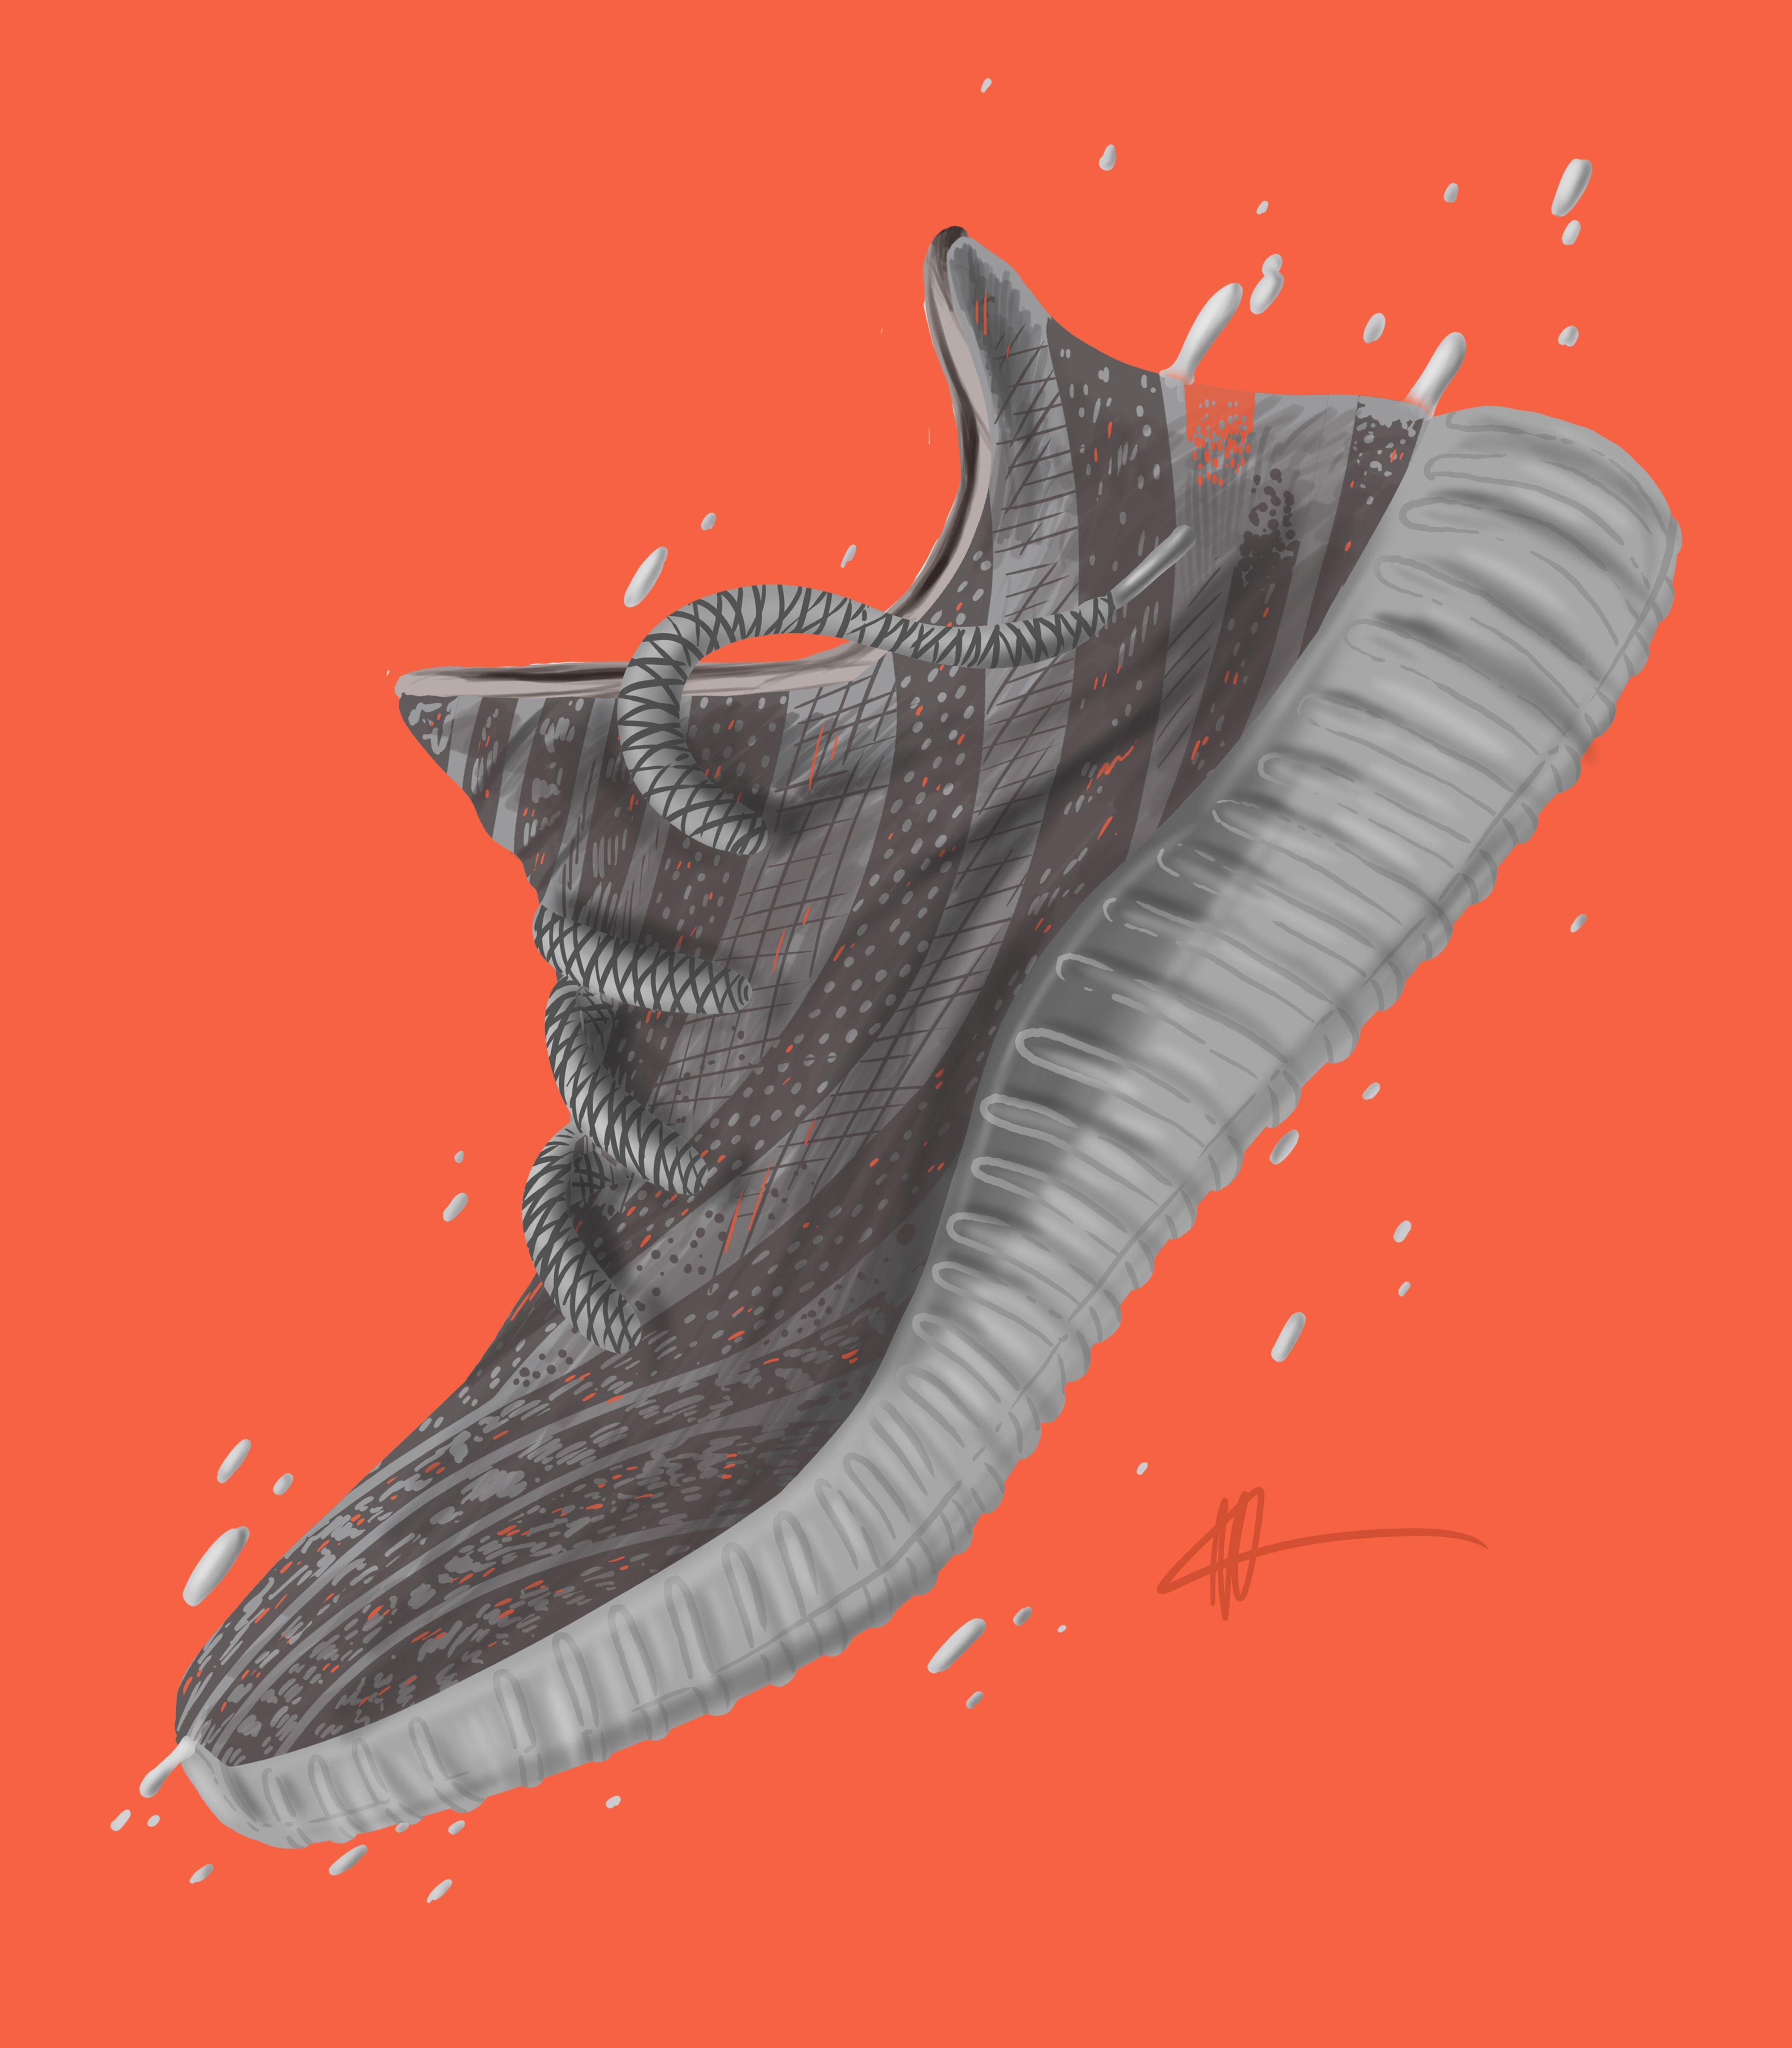 "Sneaker Art Yeezy Yeezy V2 "" Beluga"" Sneaker art"